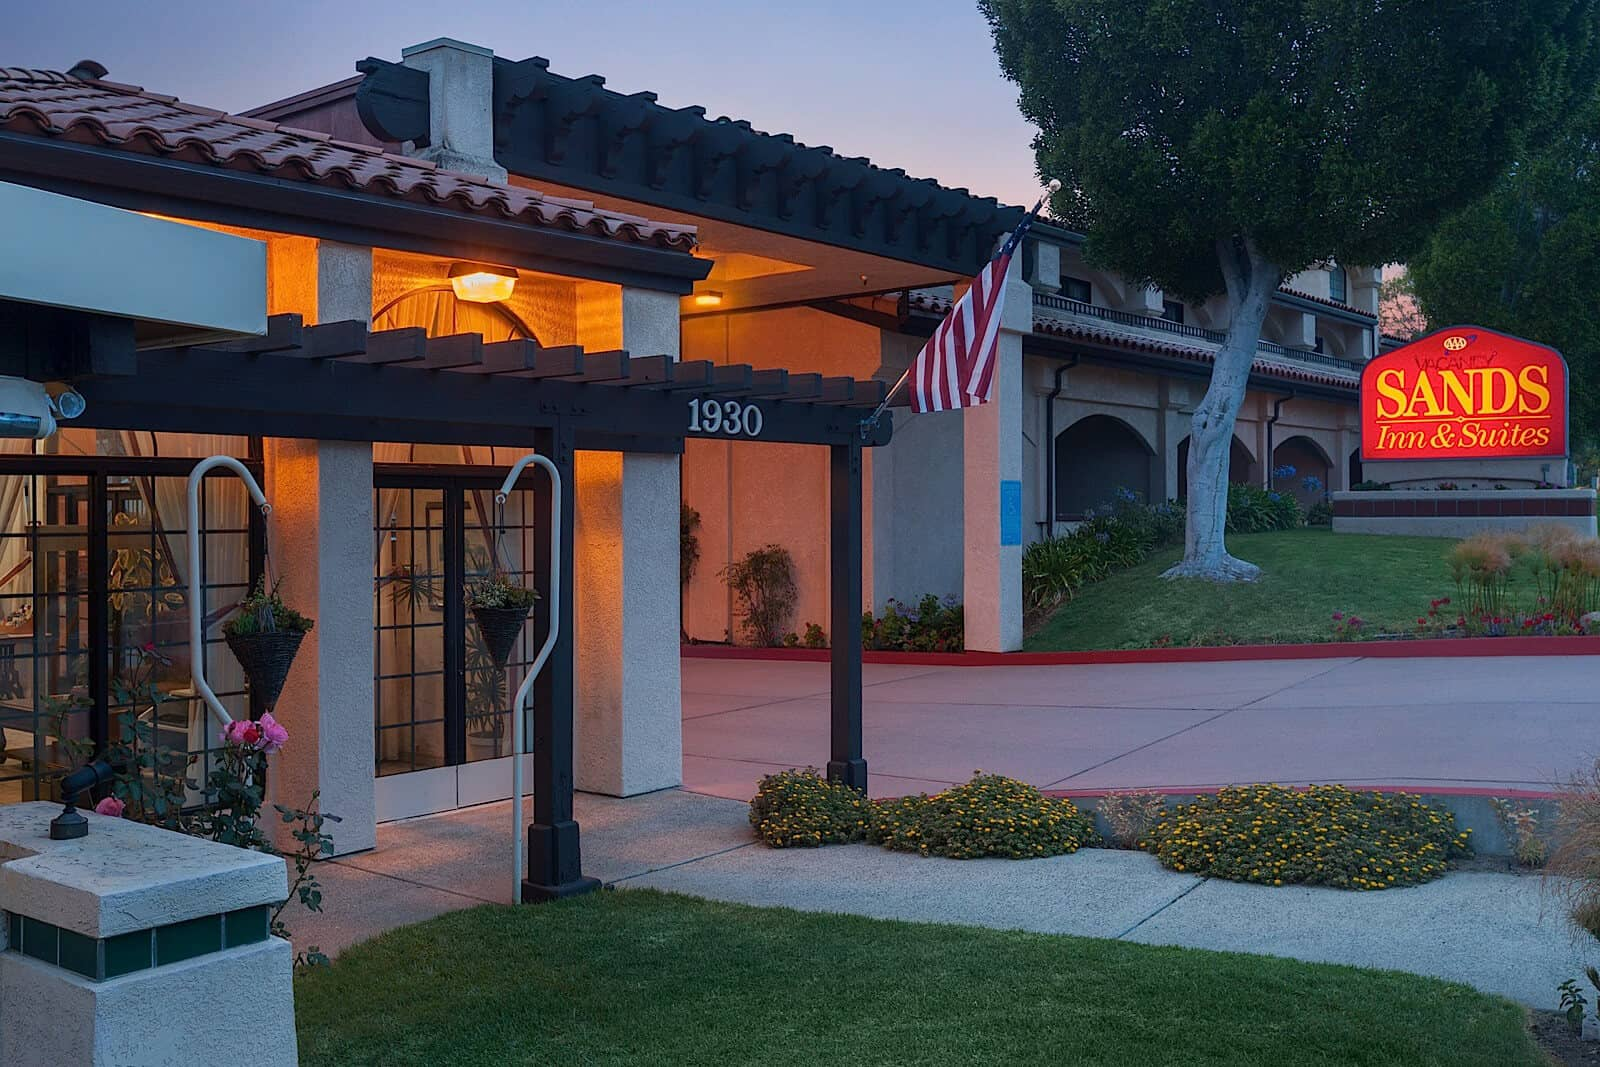 Sands Inn & Suites, a San Luis Obispo Hotel